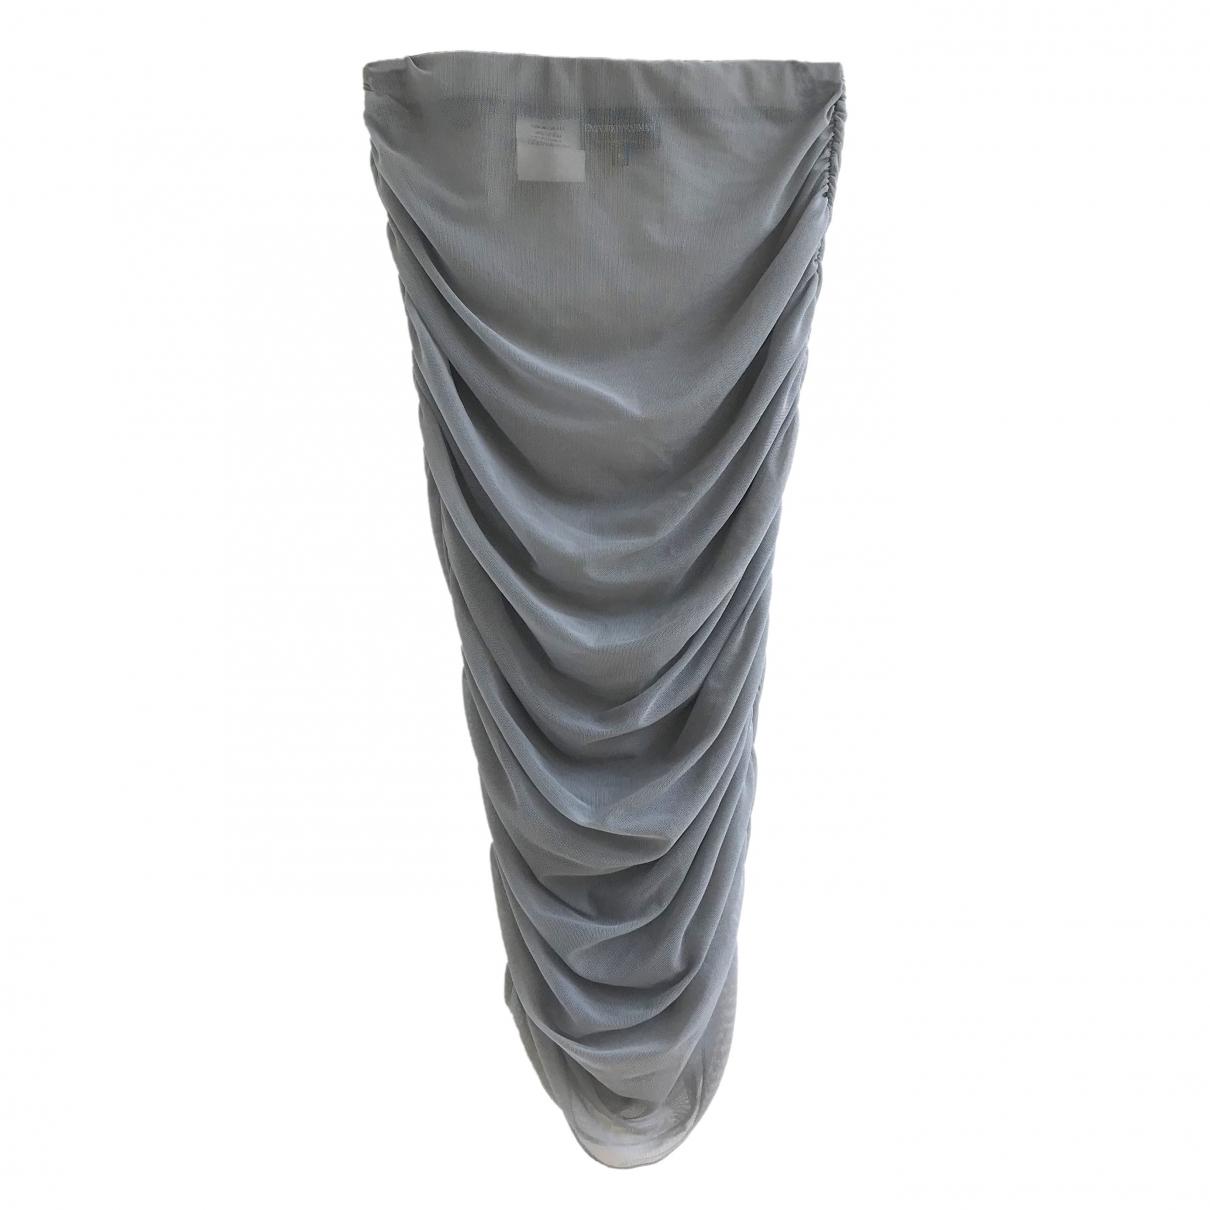 Emporio Armani \N Grey skirt for Women 40 IT